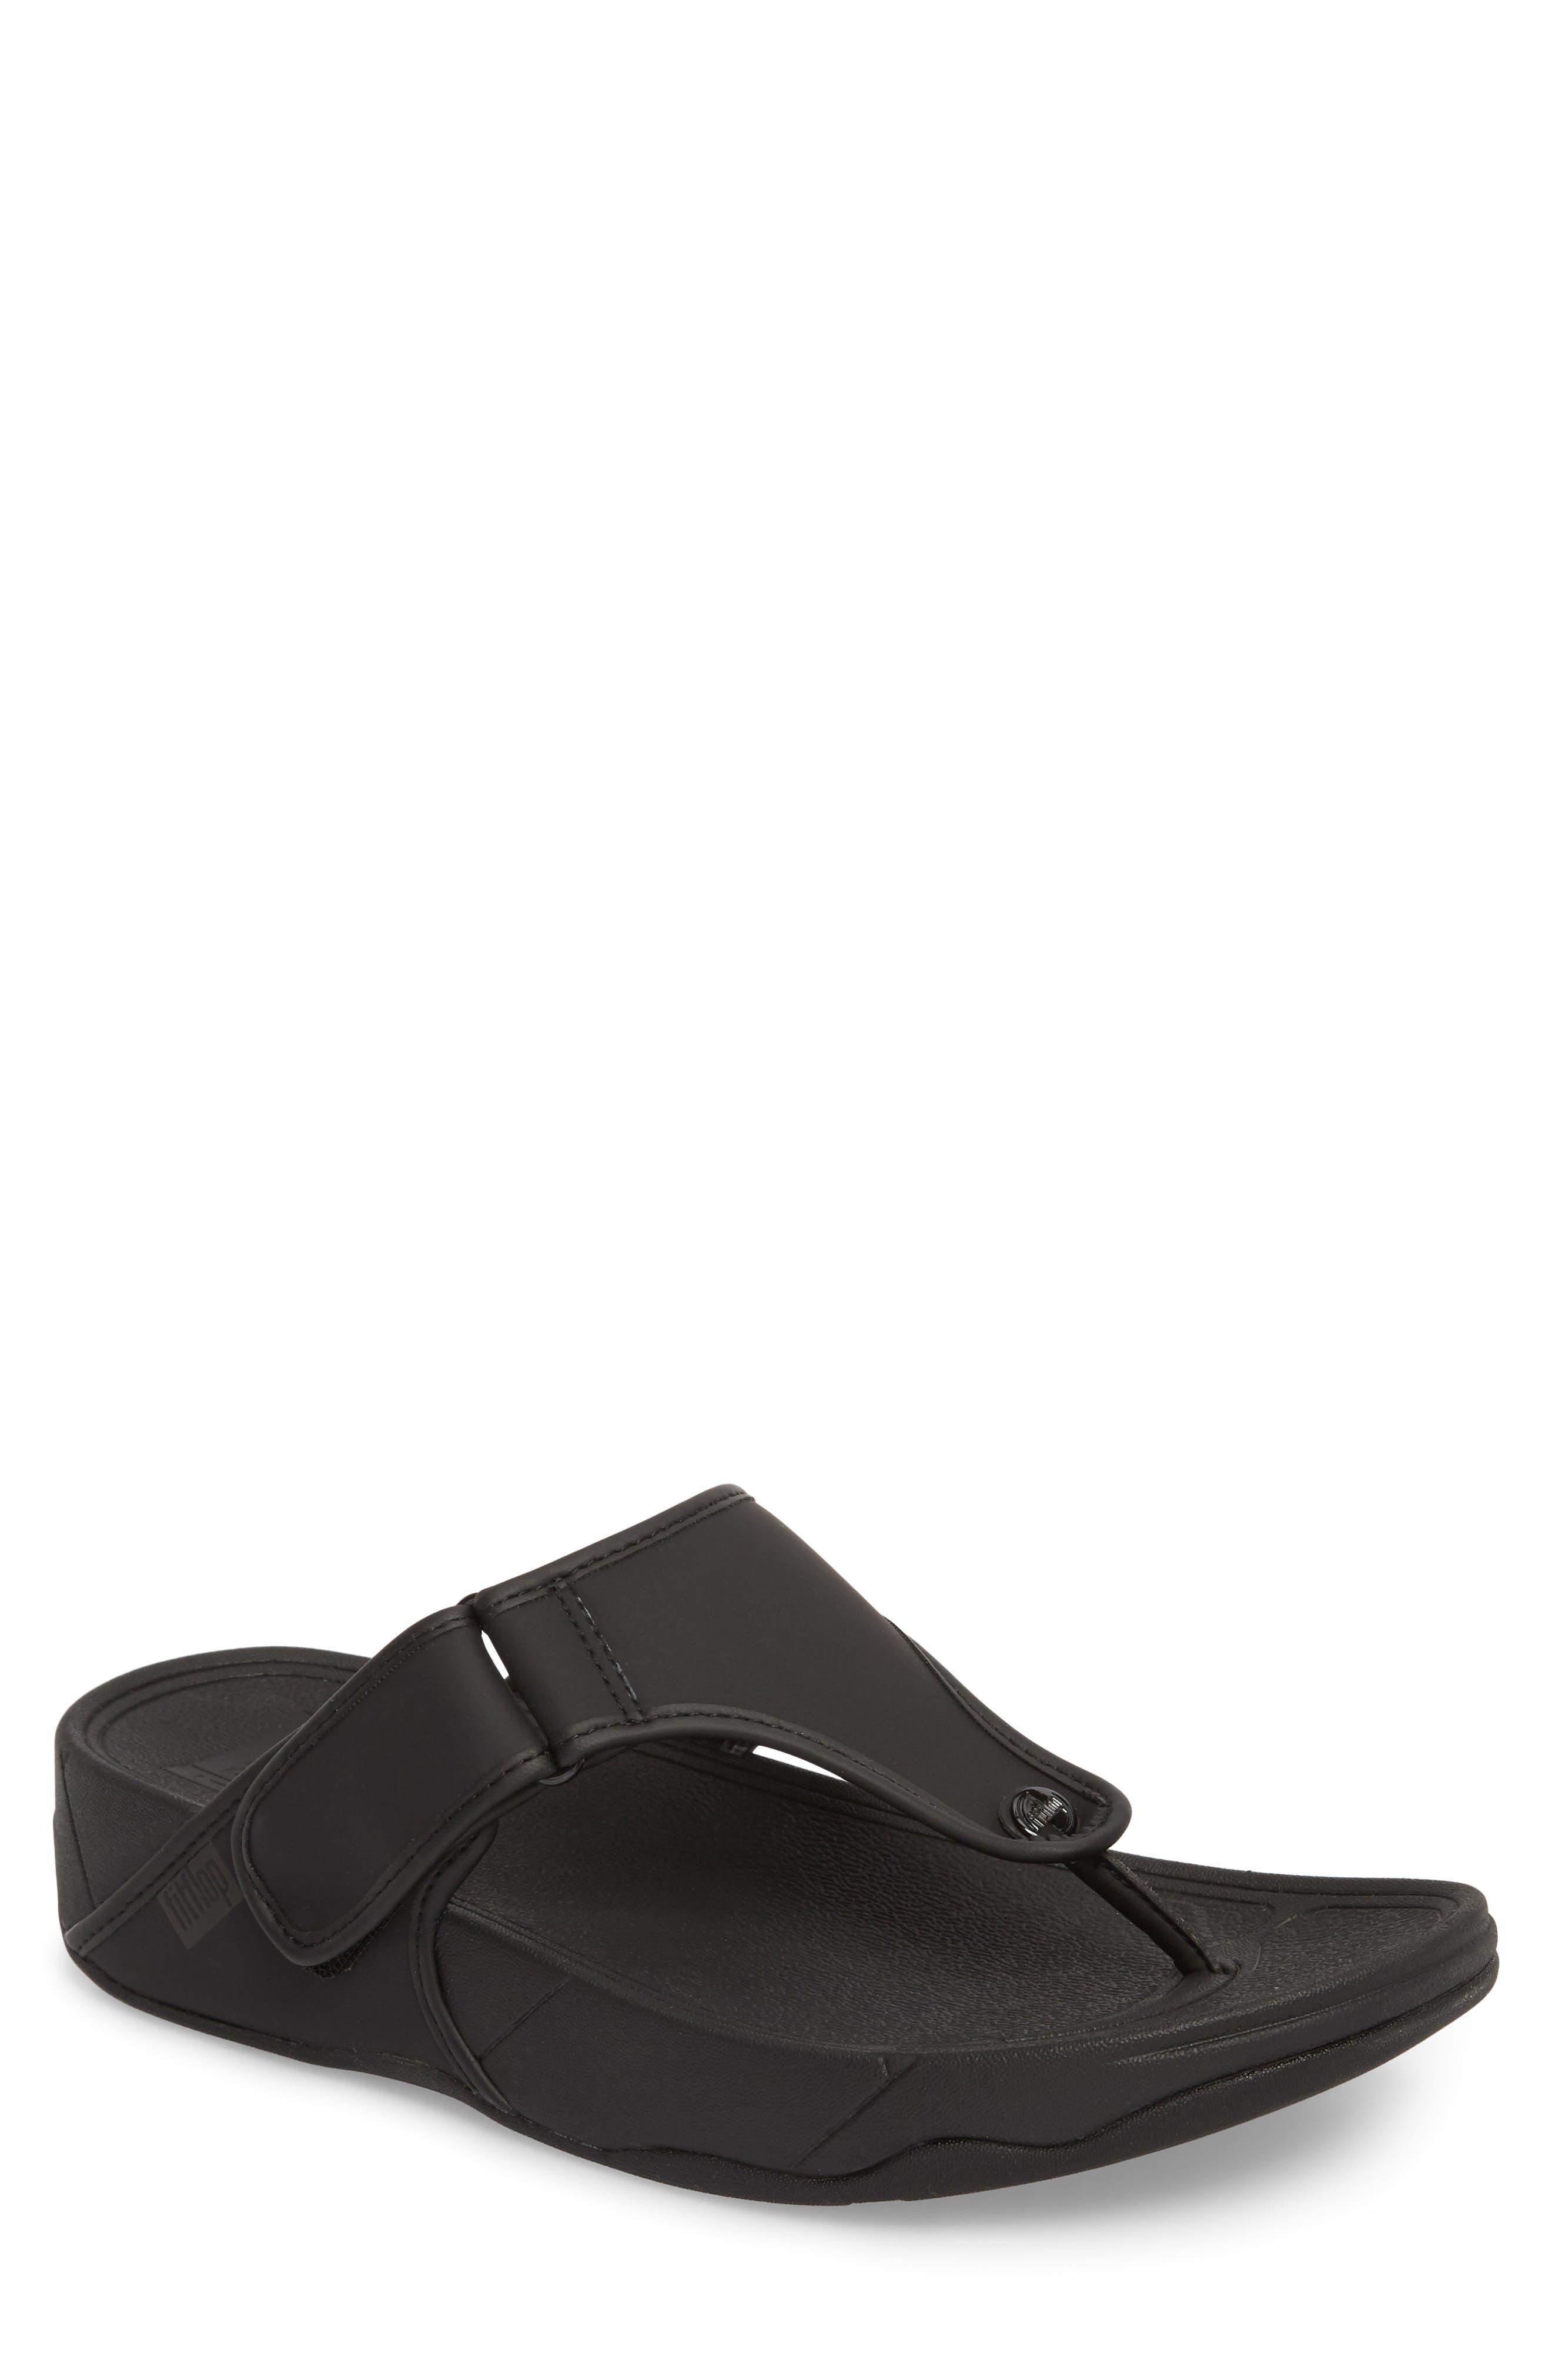 Main Image - FitFlop Trakk™ II Sandal (Men)